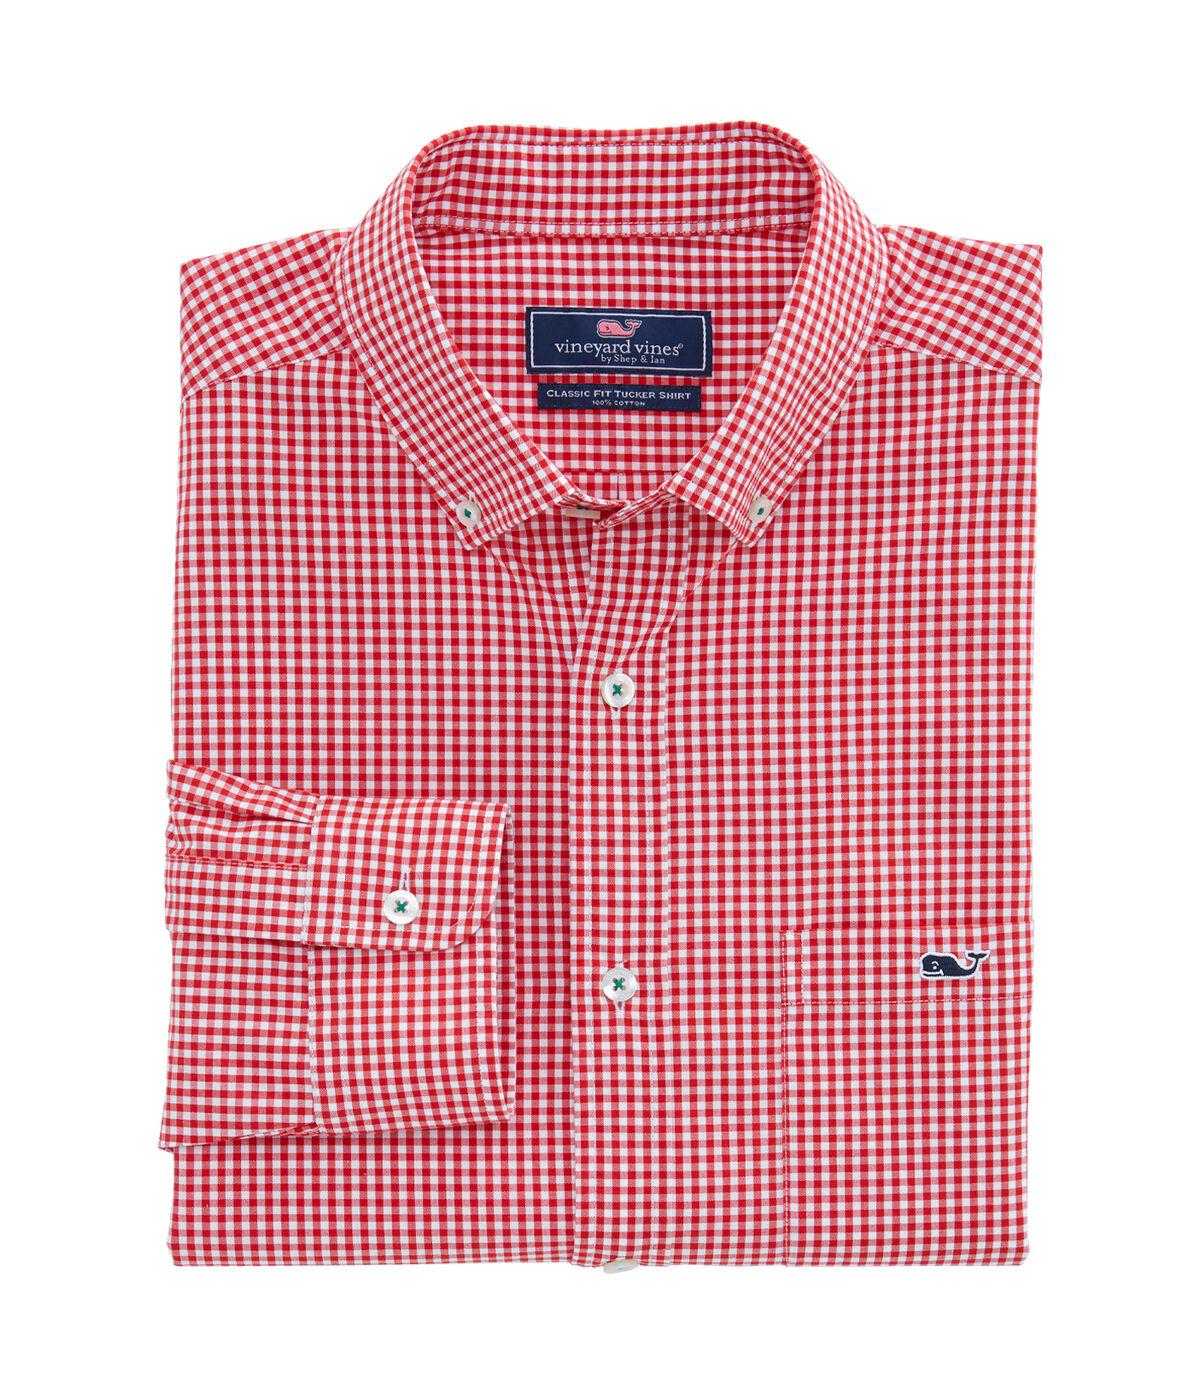 men u0027s clothing preppy clothes for men vineyard vines